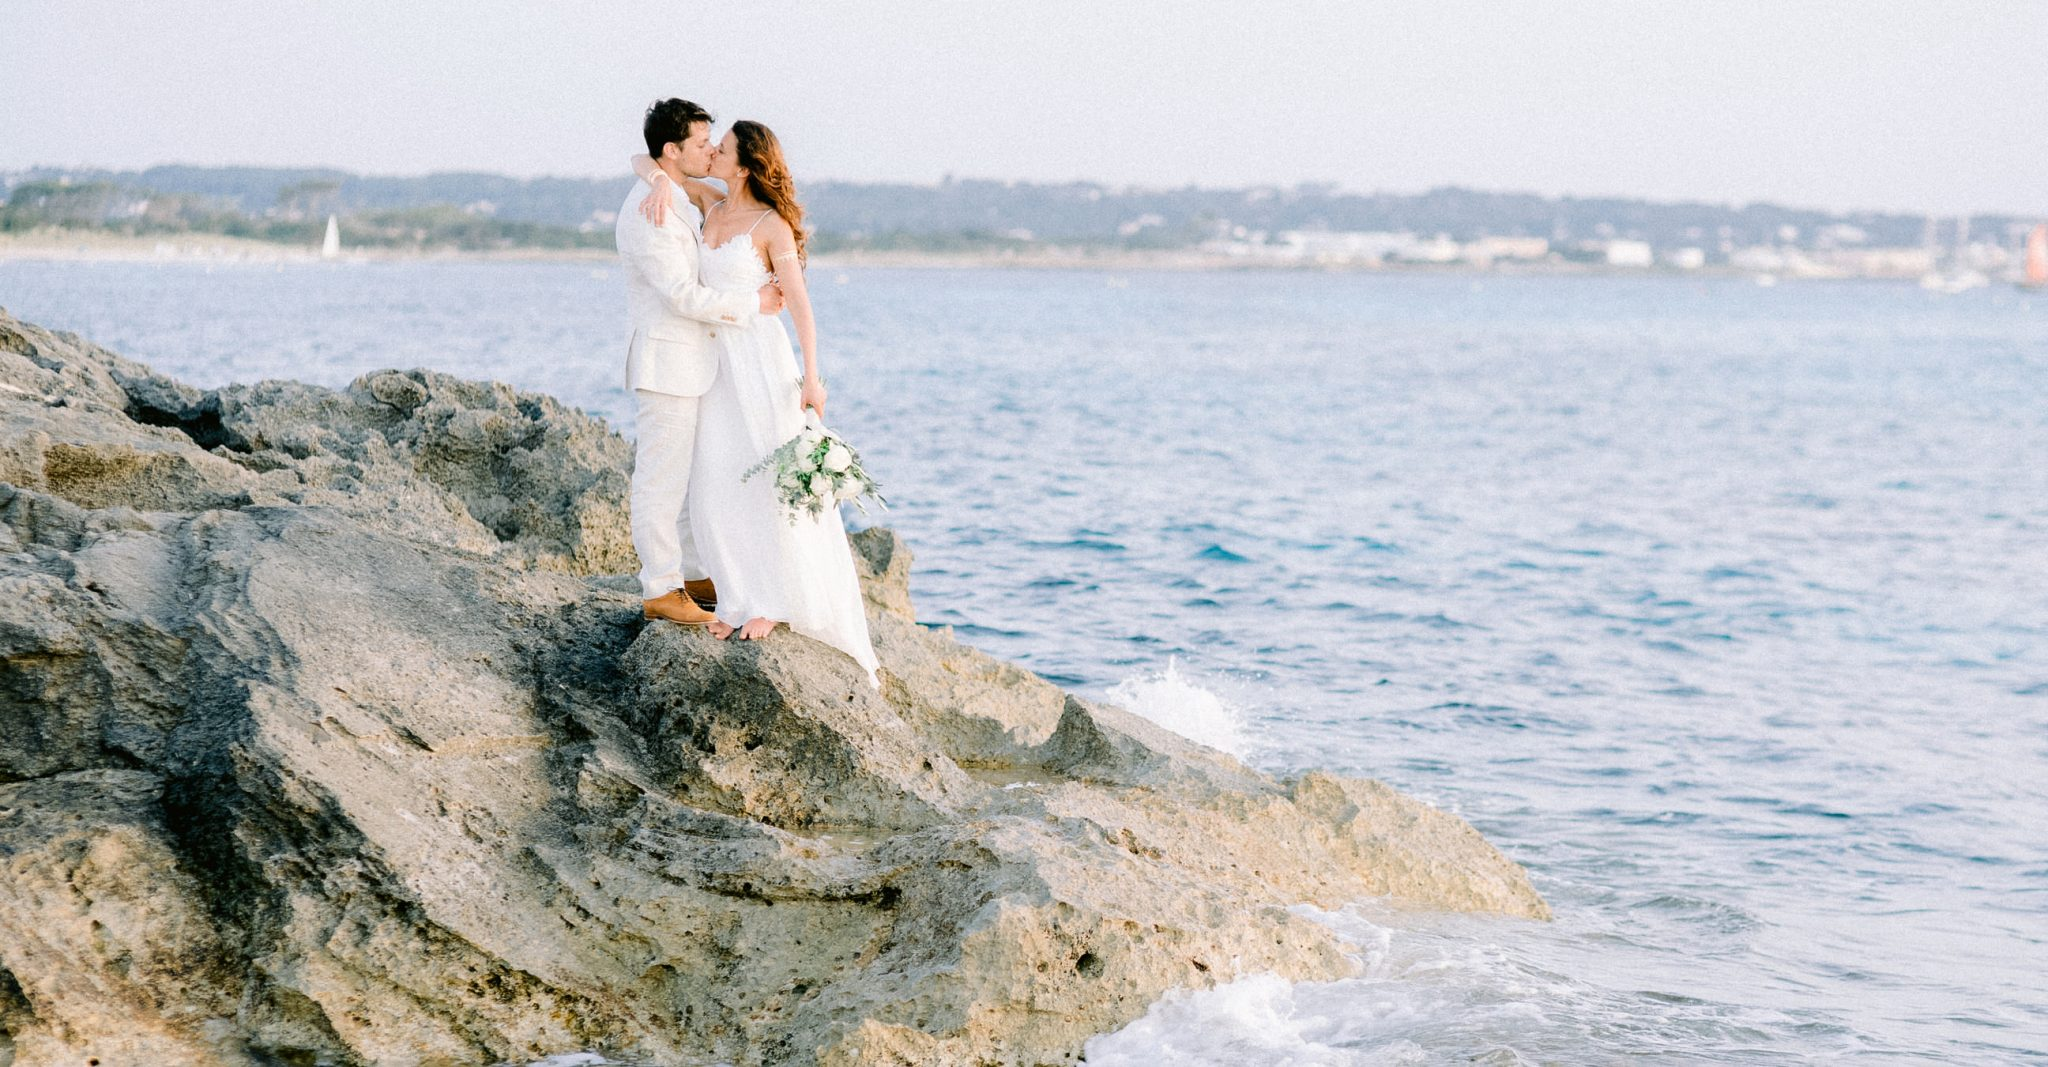 Wedding Photographer Ibiza, Youri Claessens Photography